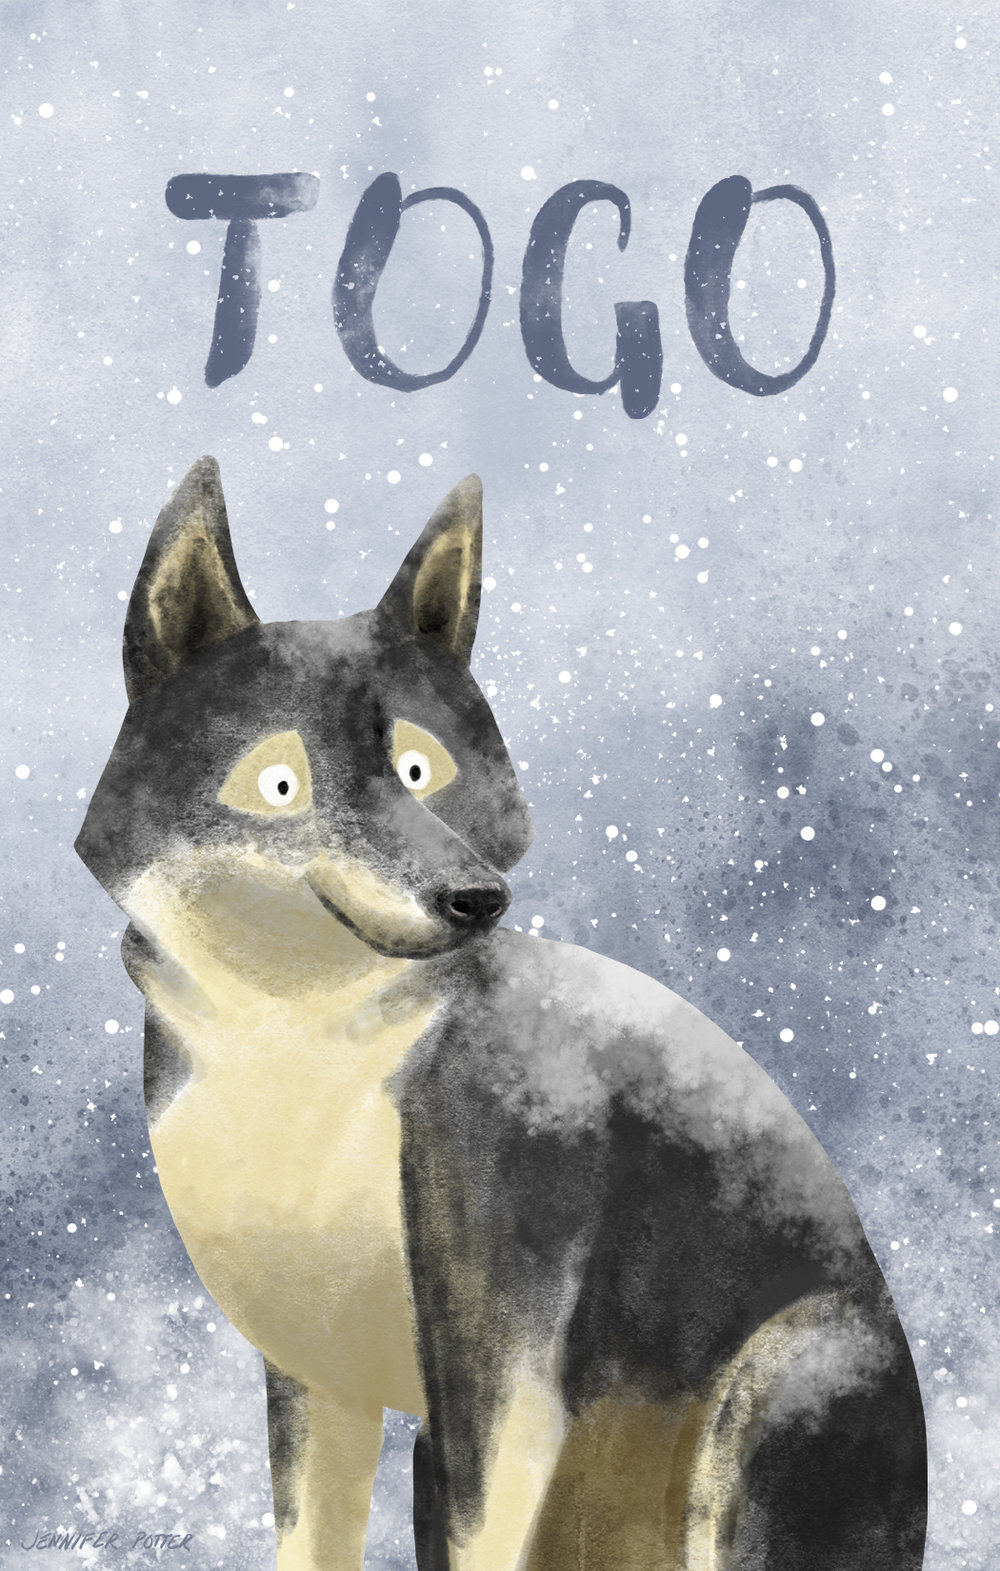 08-togo-5xy-FINAL.jpg